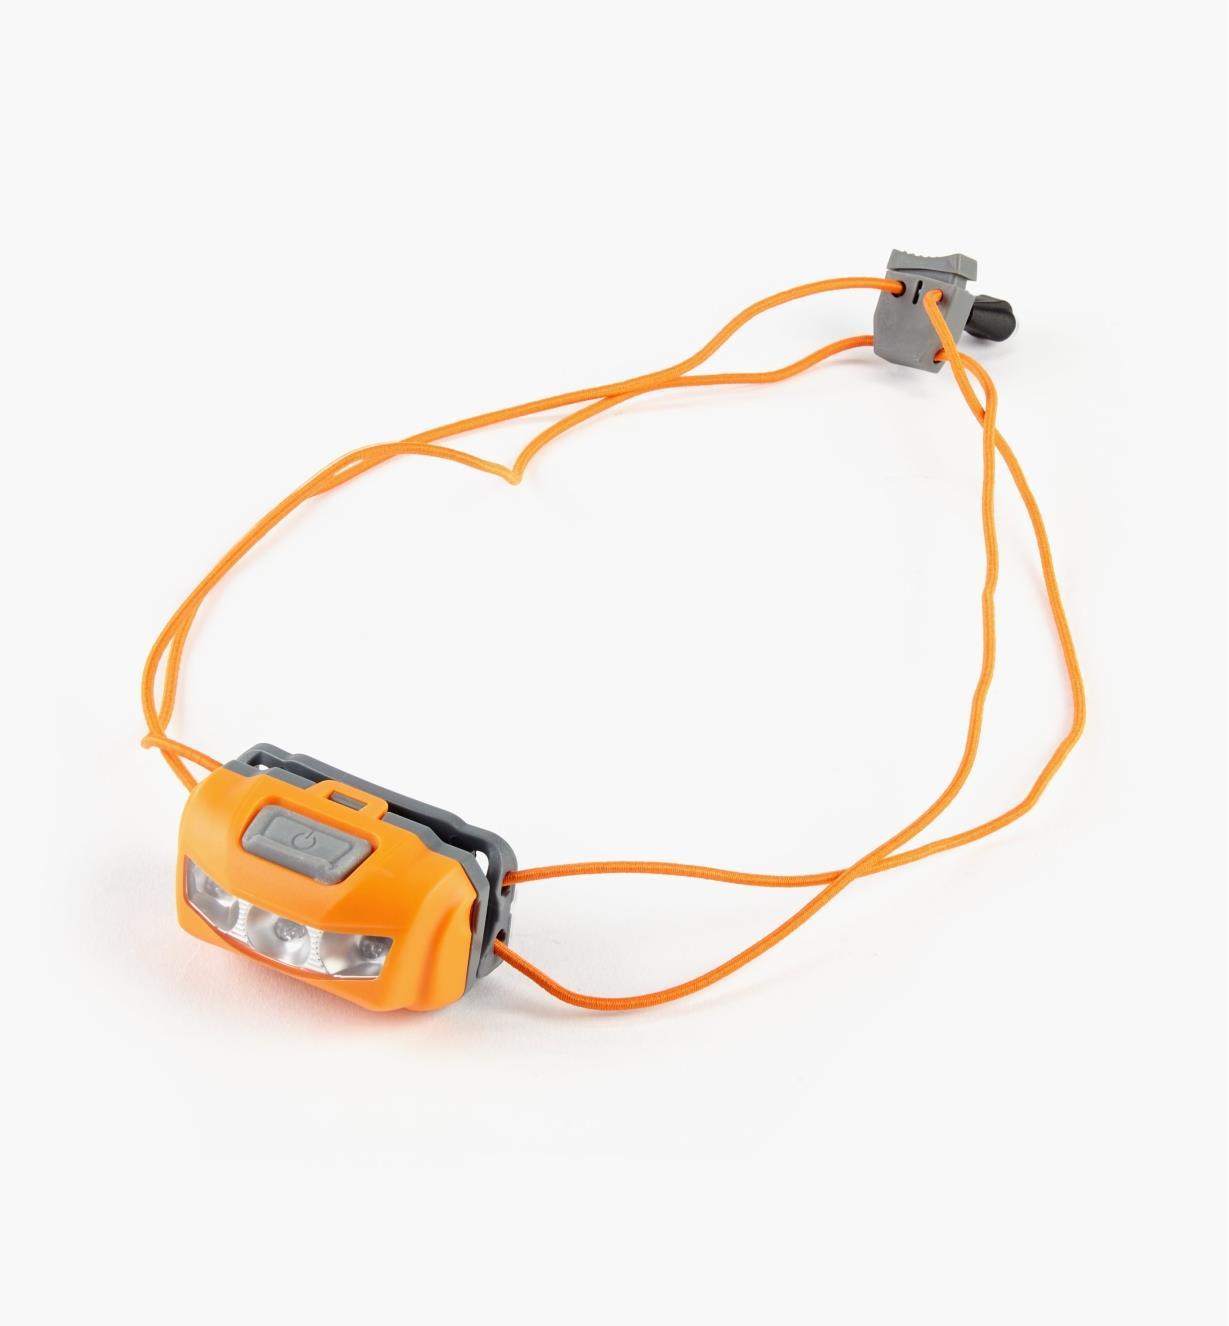 99W8654 - UST LED Headlamp